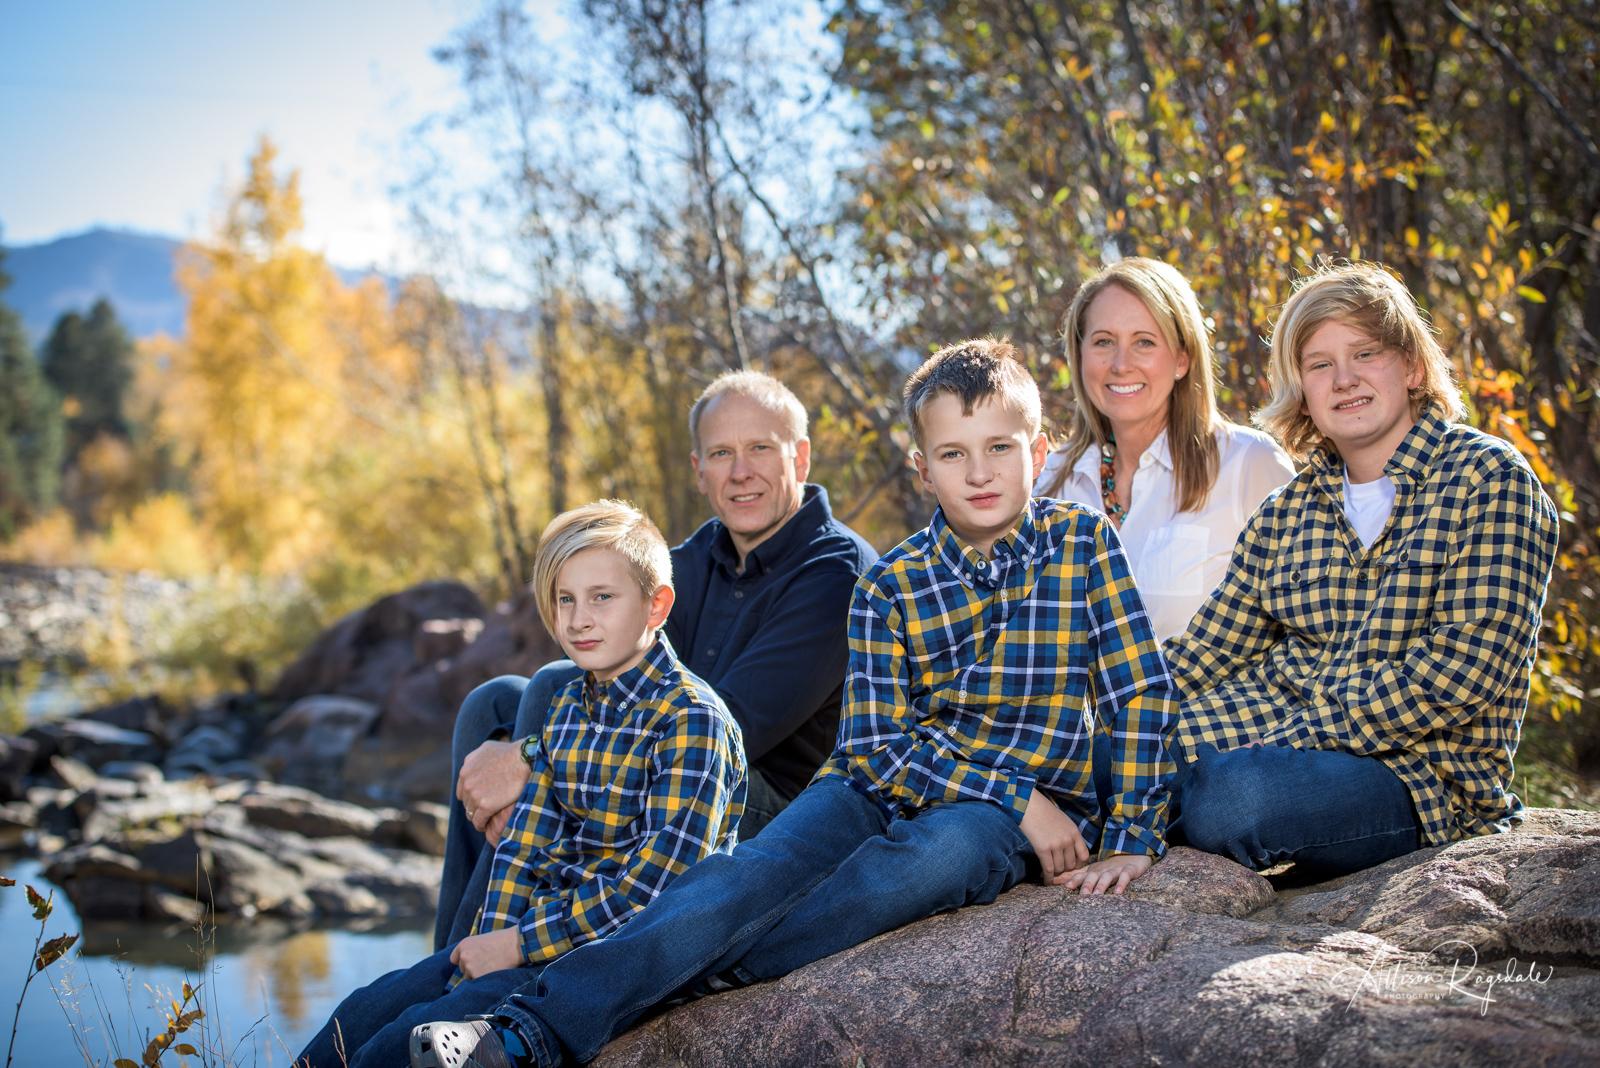 Sherwin Family Portraits | Durango Colorado